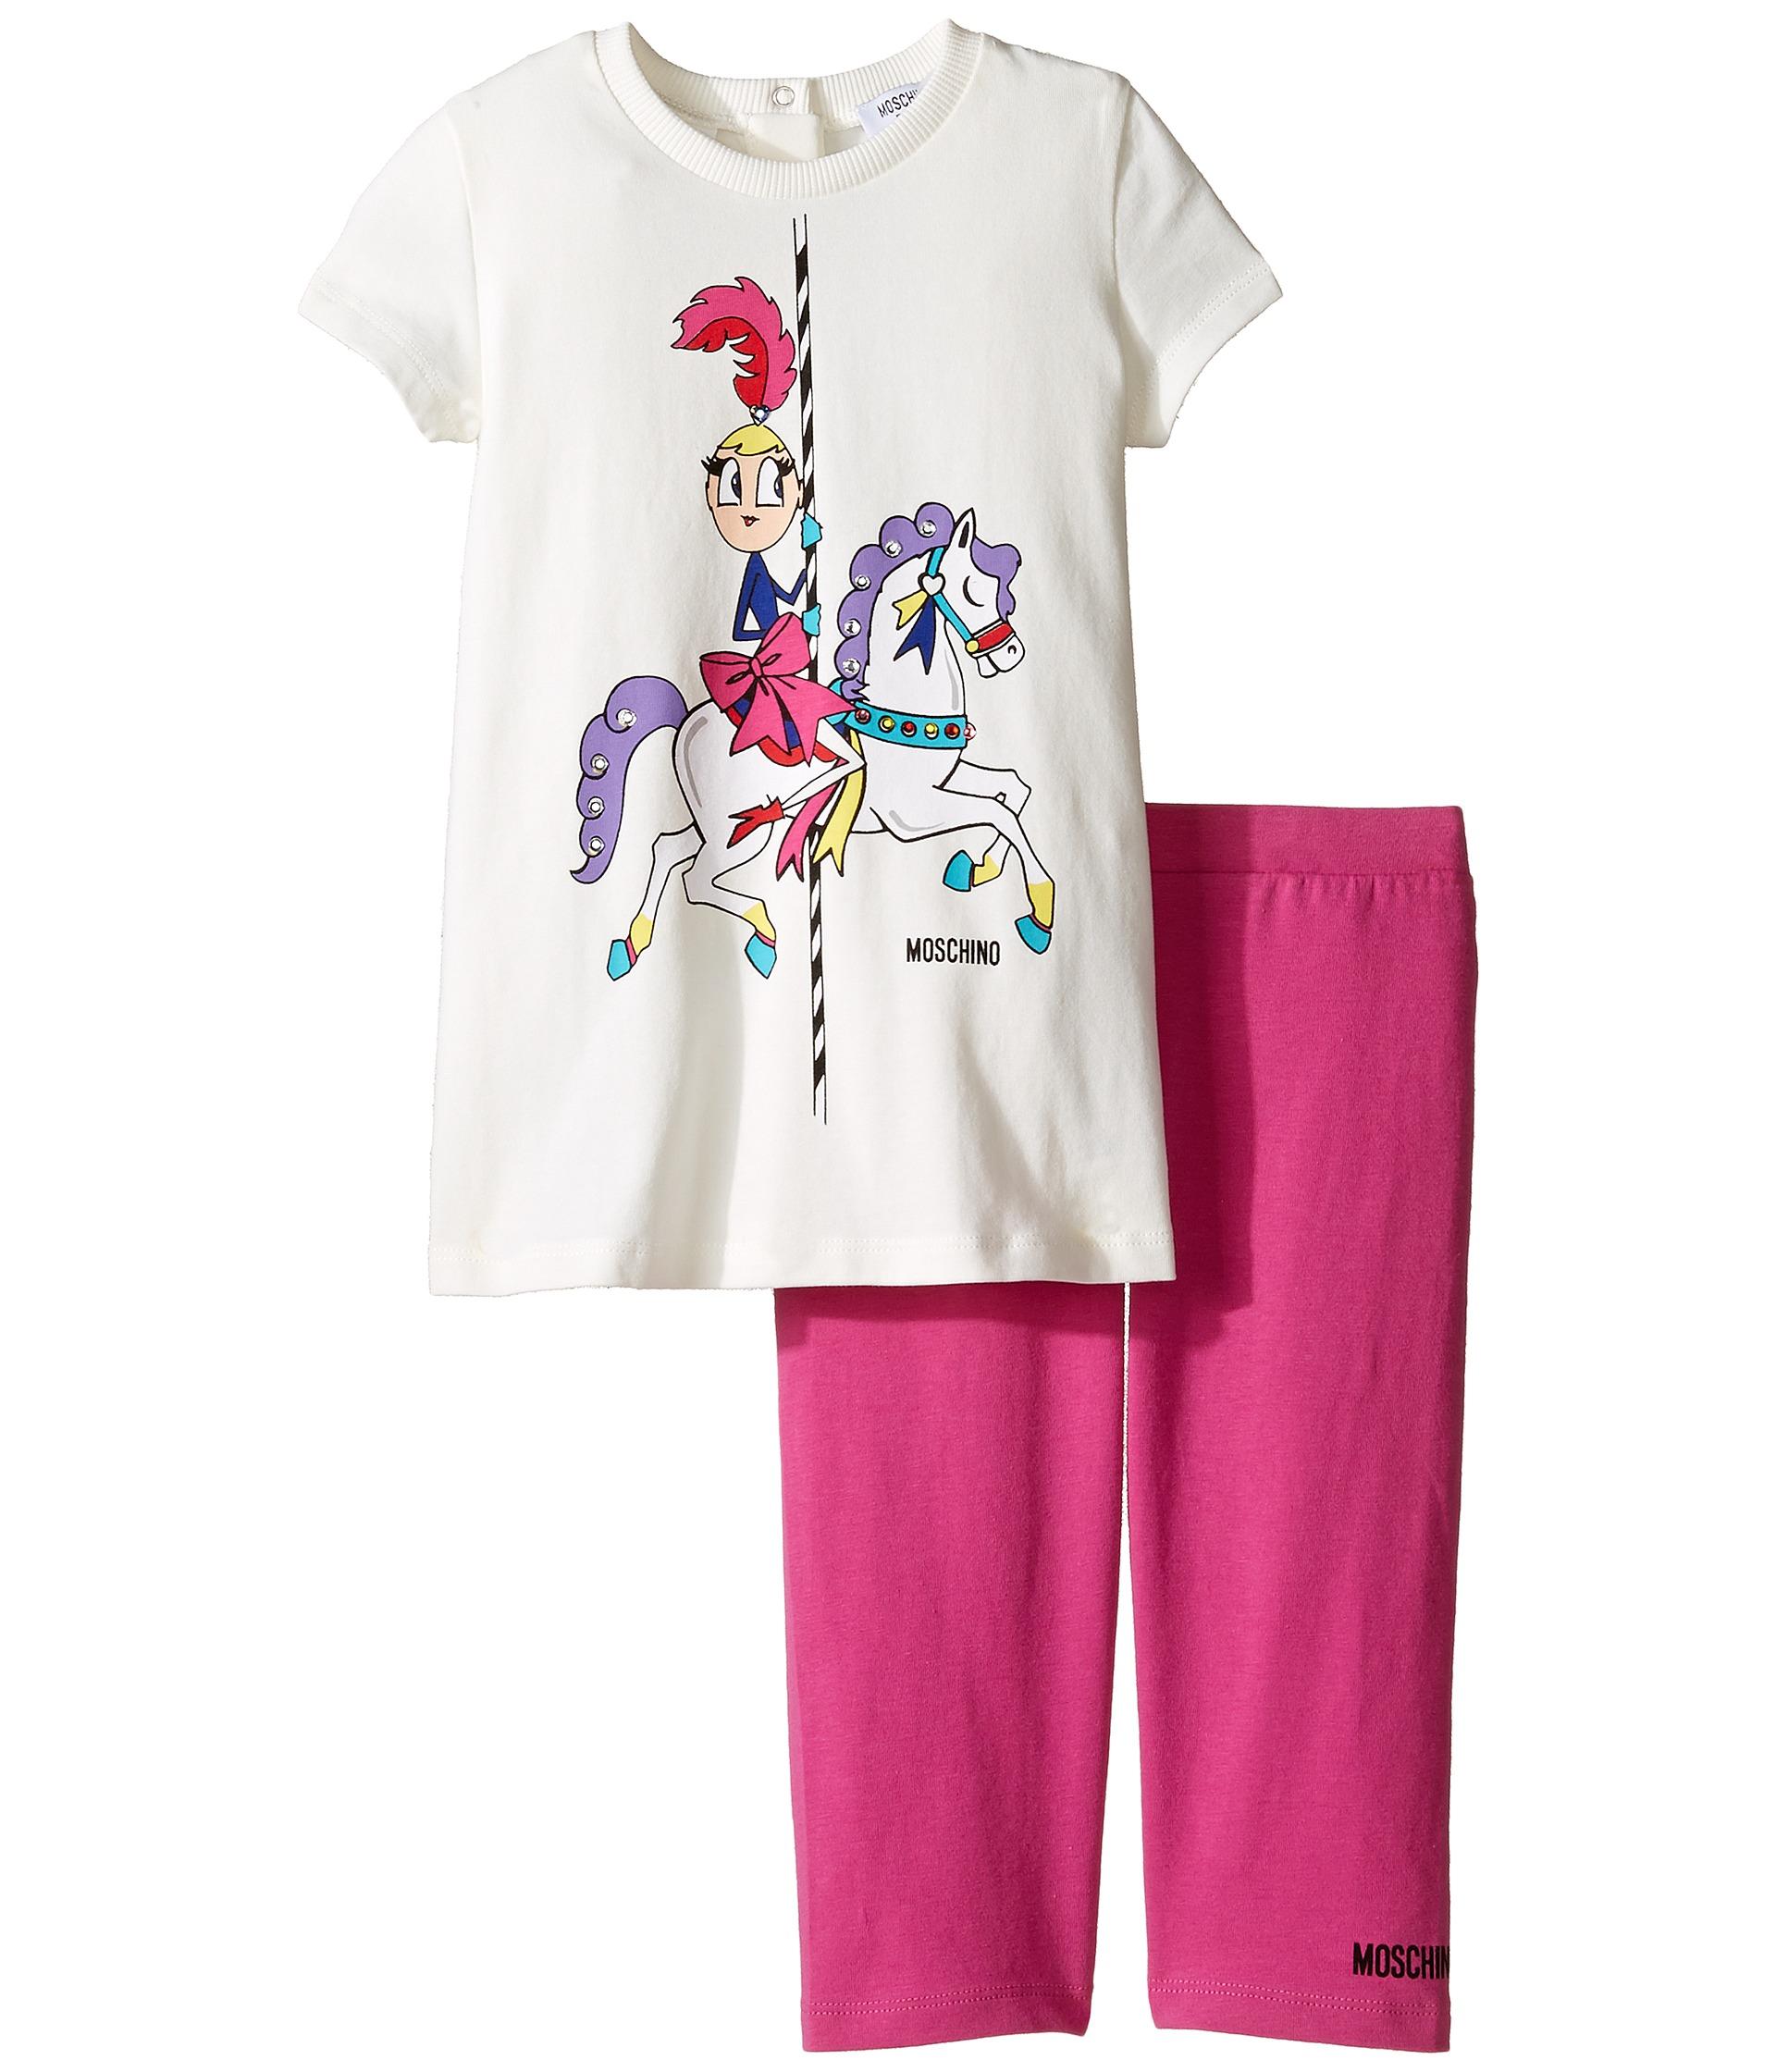 Moschino Kids Carousel Graphic T Shirt & Leggings Set